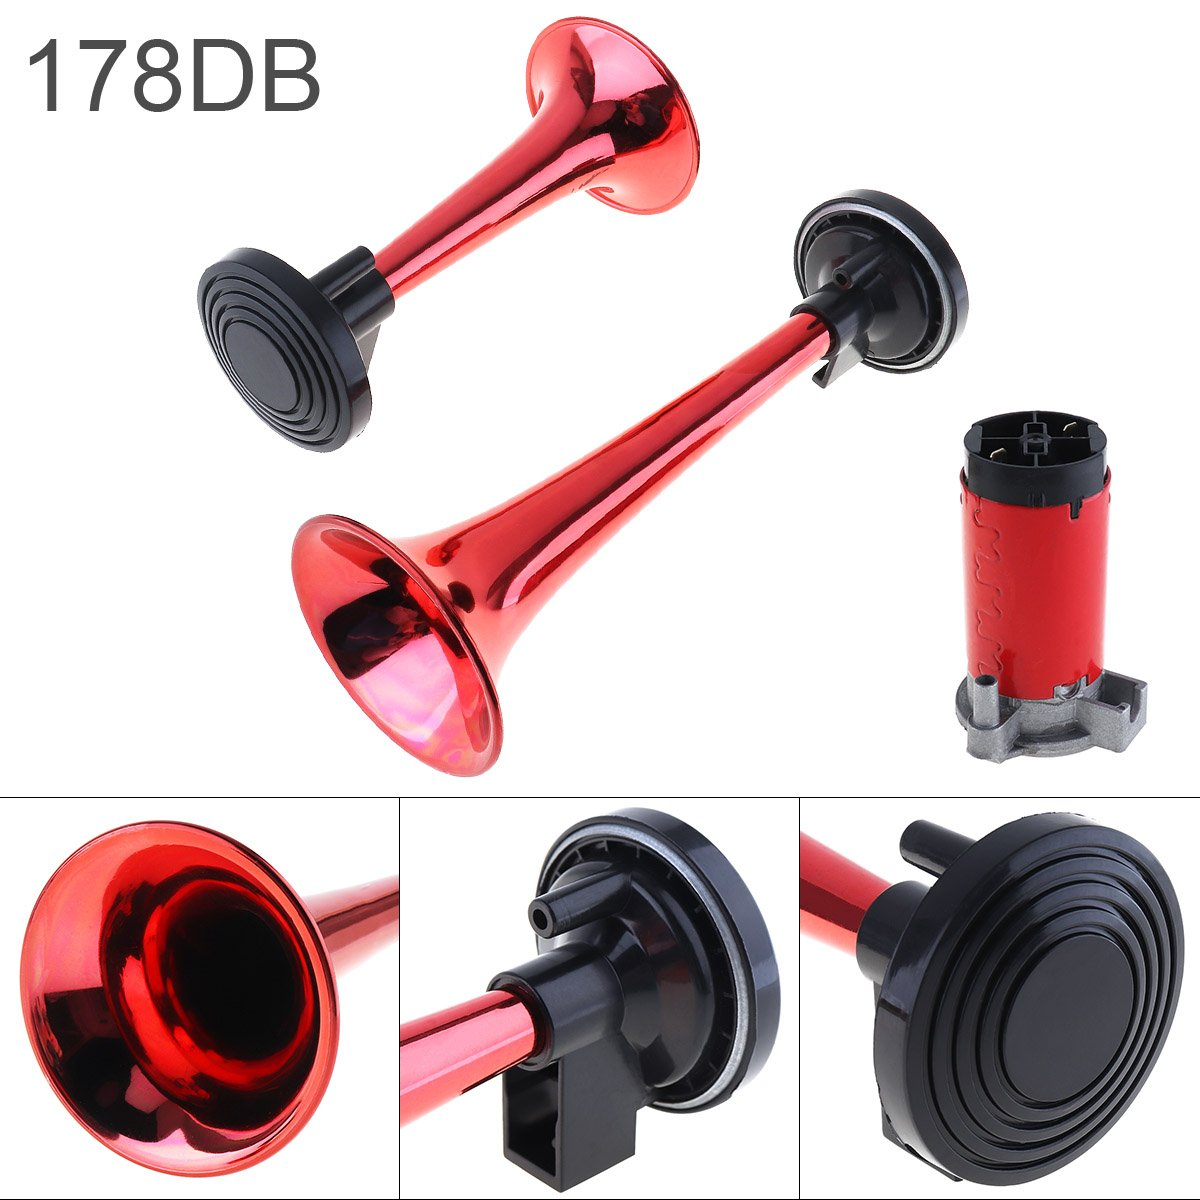 12V 178dB Super Loud Dual Tone Air Horn Set Trumpet Compressor for Motorcycle Car Boat Truck